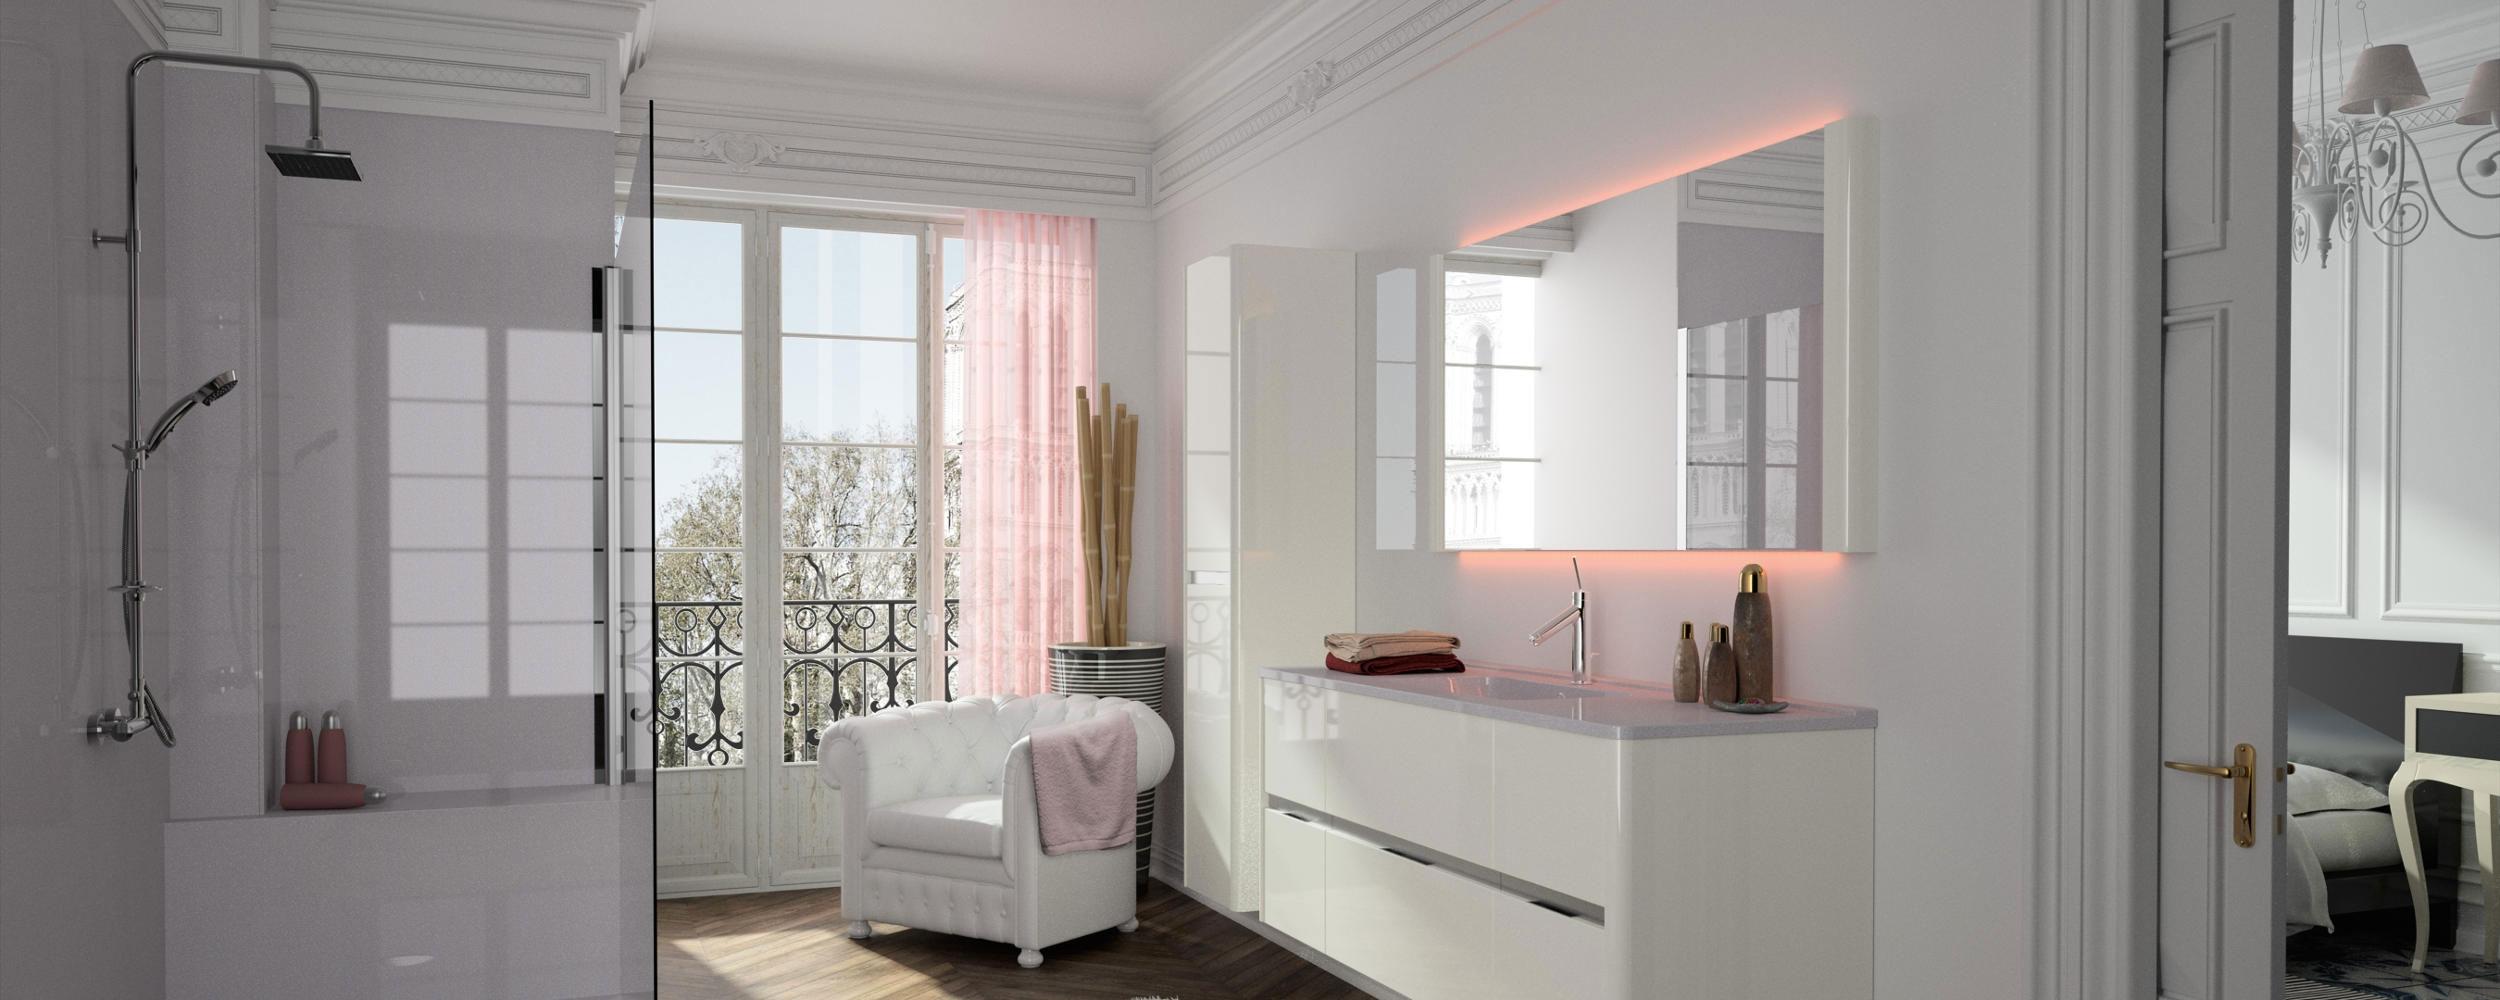 ambiance bain bathroom design scotland